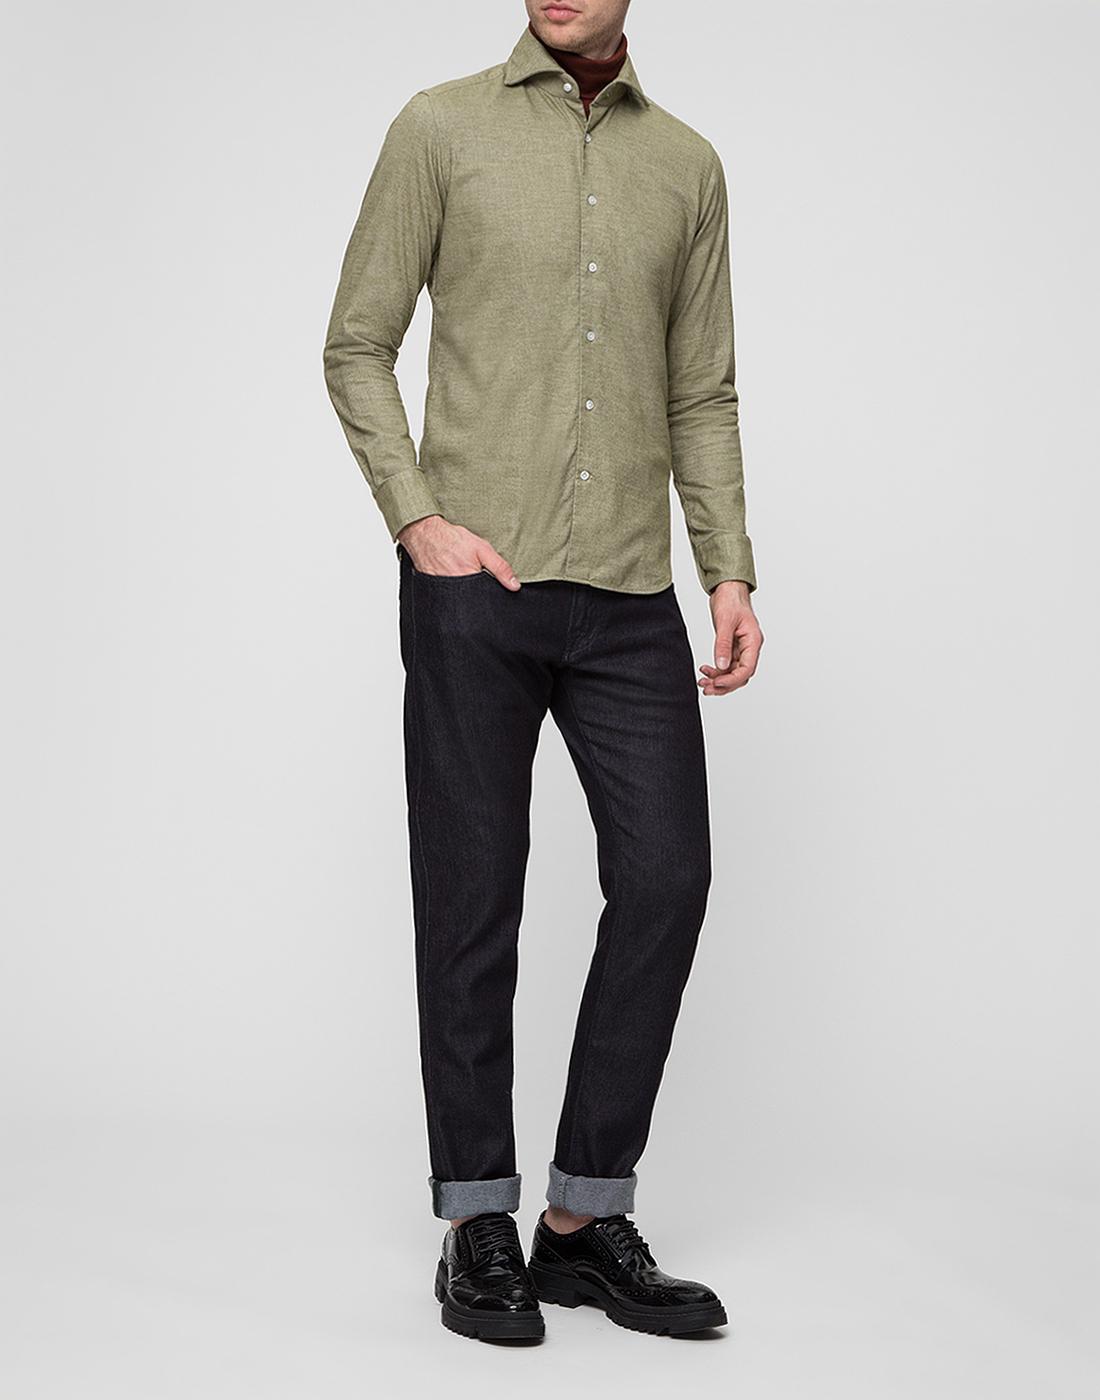 Мужская рубашка оливкового цвета Bagutta S08408.060-5